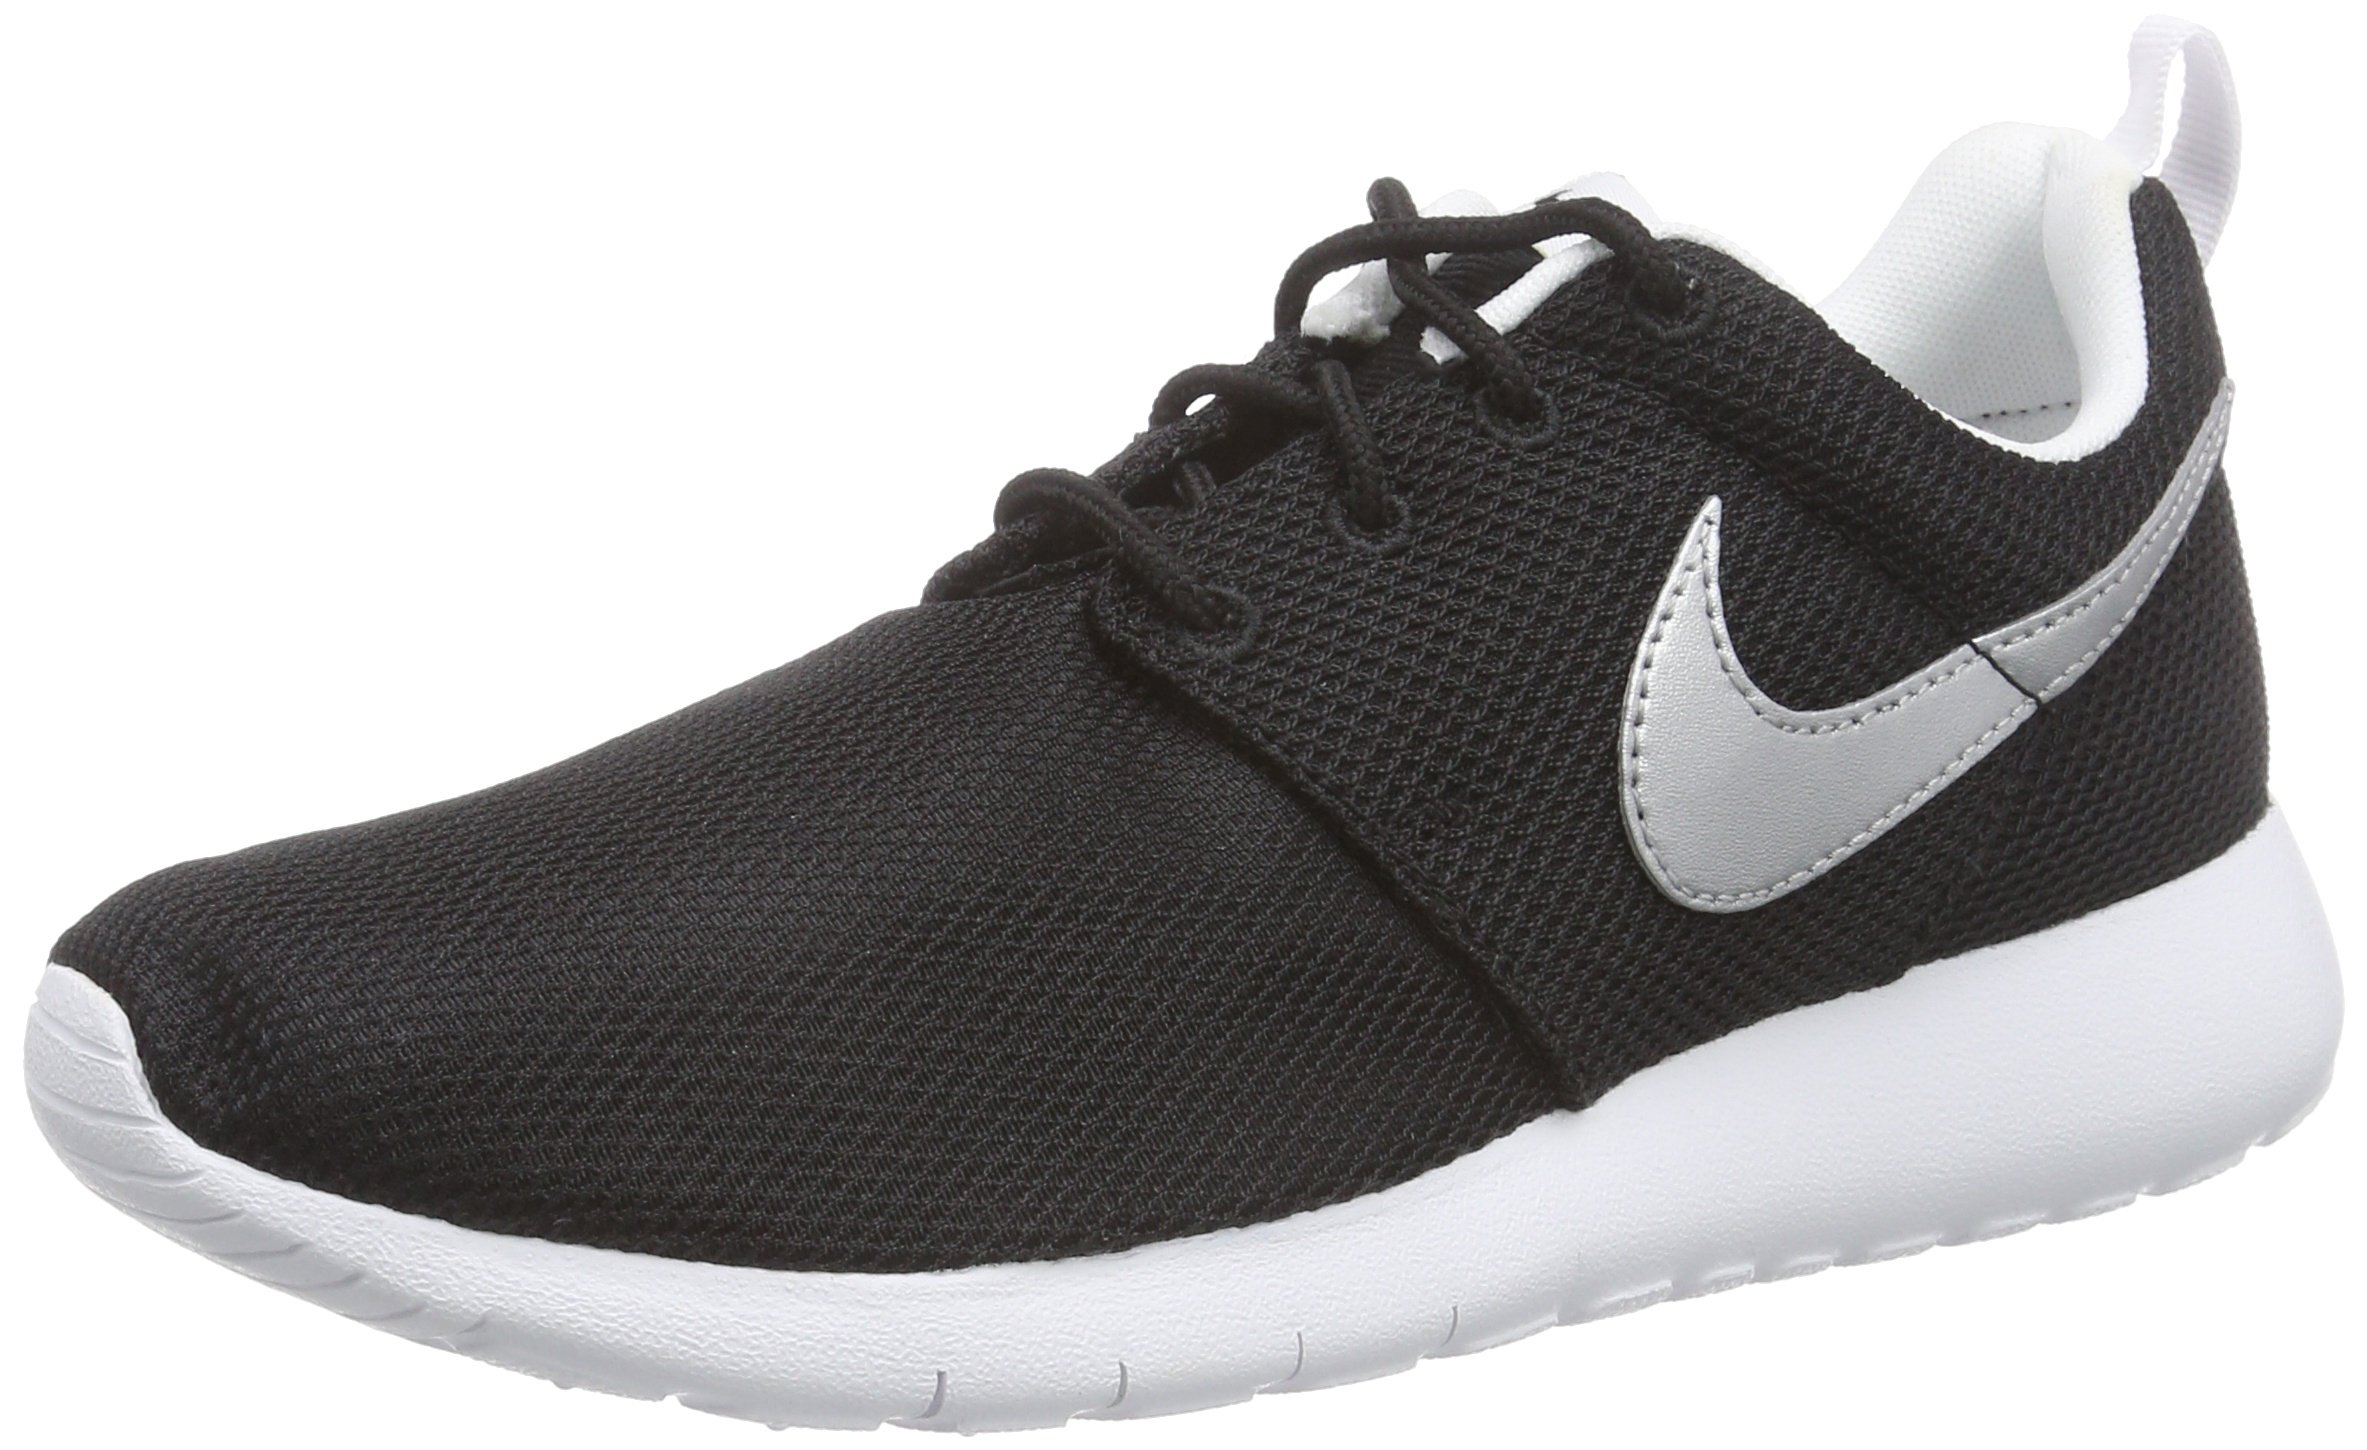 Nike Kid's Roshe One GS Black/White/White/Metallic Silver (6)